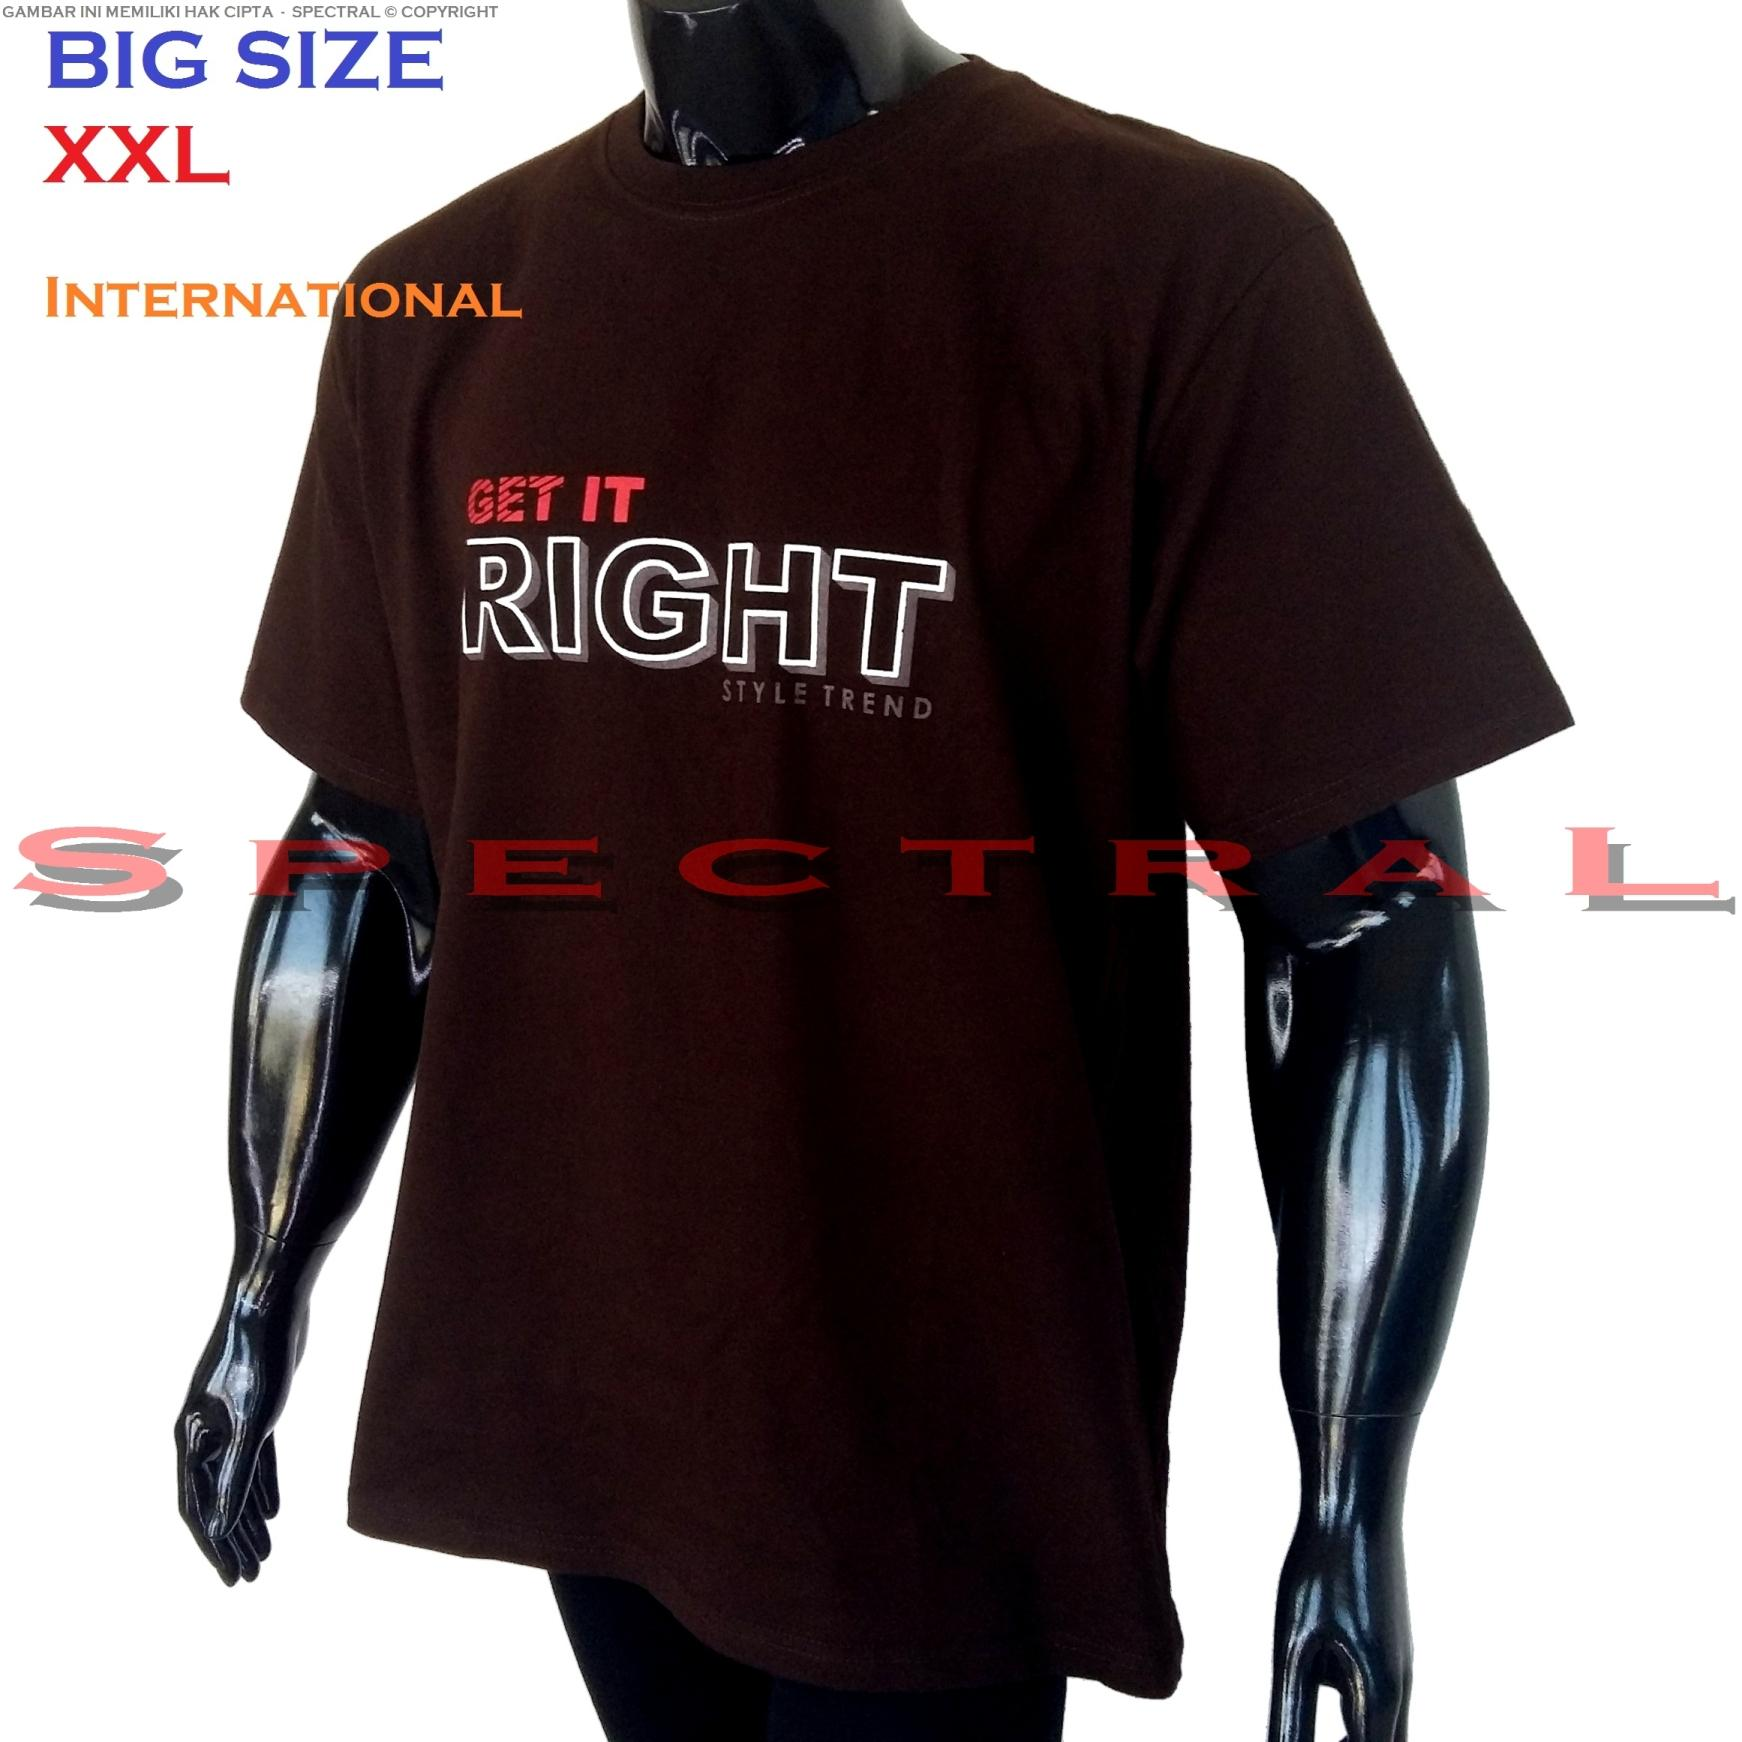 Spectral – BIG SIZE XXL INTERNATIONAL 100{55e037da9a70d2f692182bf73e9ad7c46940d20c7297ef2687c837f7bdb7b002} Soft Cotton Combed Kaos Distro Jumbo BIGSIZE T-Shirt Fashion Ukuran Besar Polos Celana Atasan Pria Wanita Katun Bapak Orang Tua Gemuk Gendut Lengan Simple Sport Casual 2L 2XL Baju Cowo Cewe Pakaian Terbaru GET